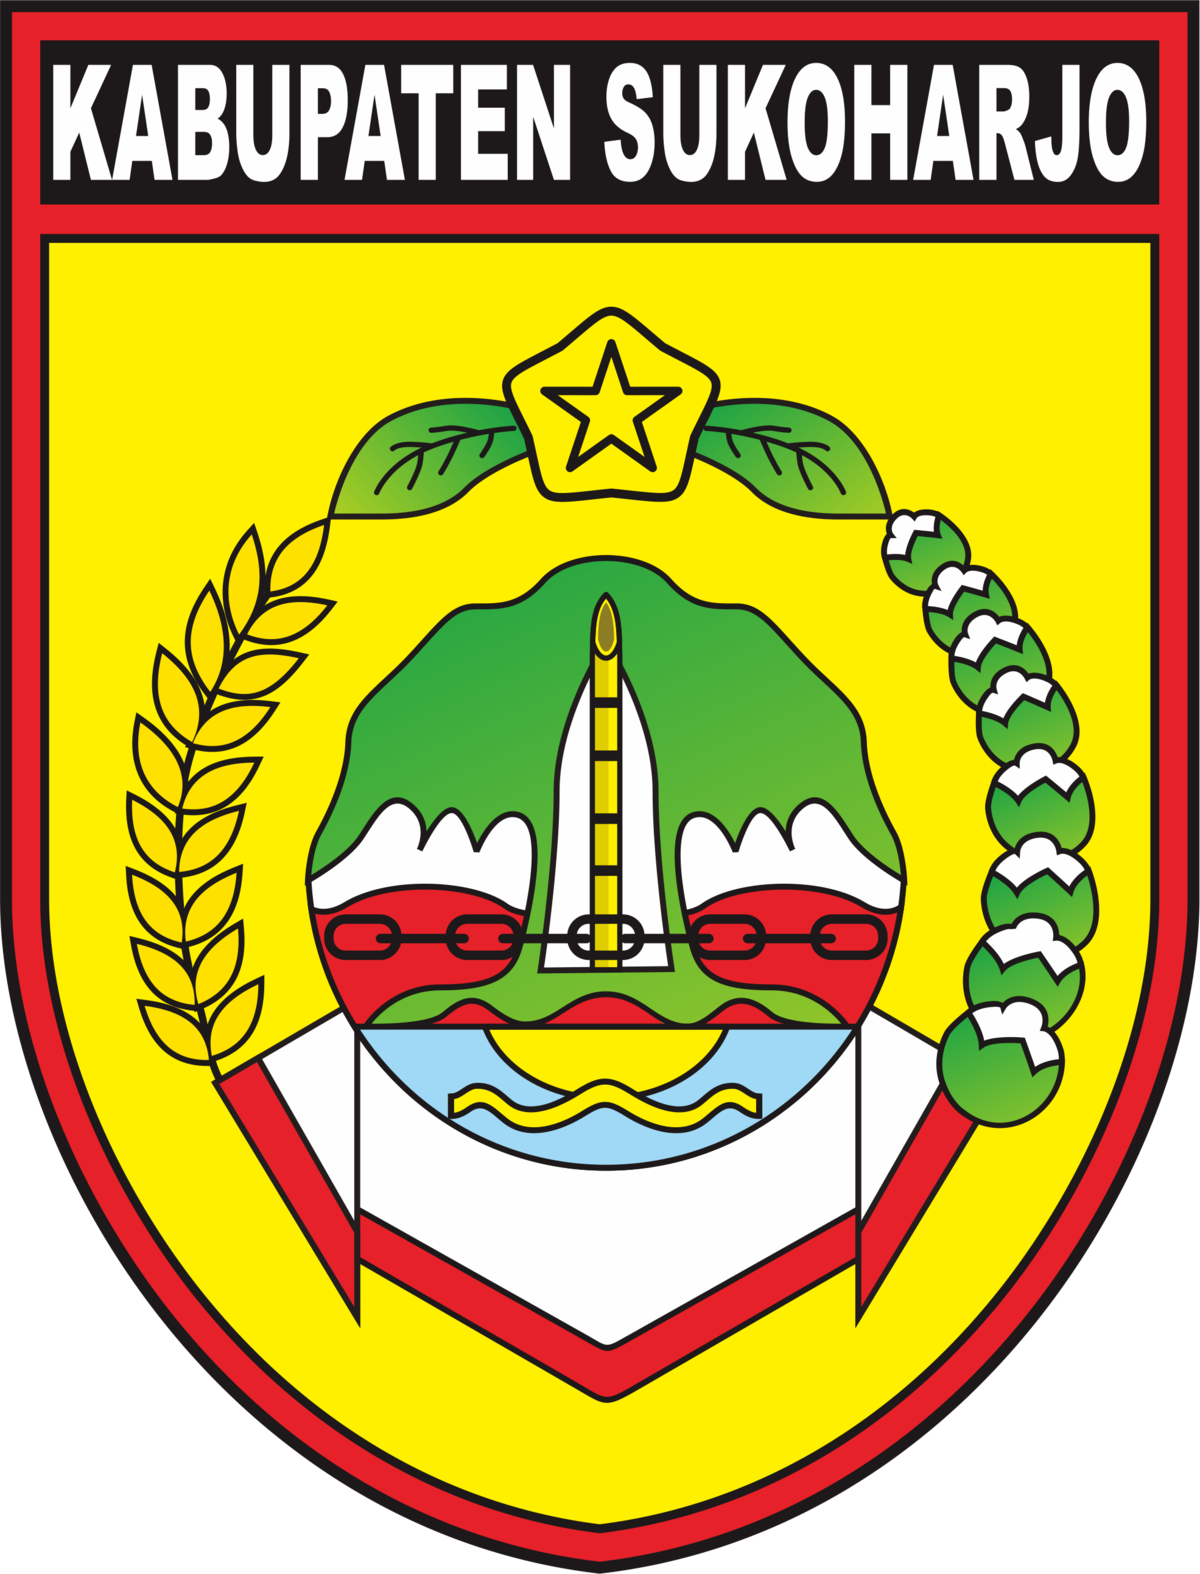 Kabupaten Sukoharjo Wikipedia Bahasa Indonesia Ensiklopedia Bebas Makam Ki Ageng